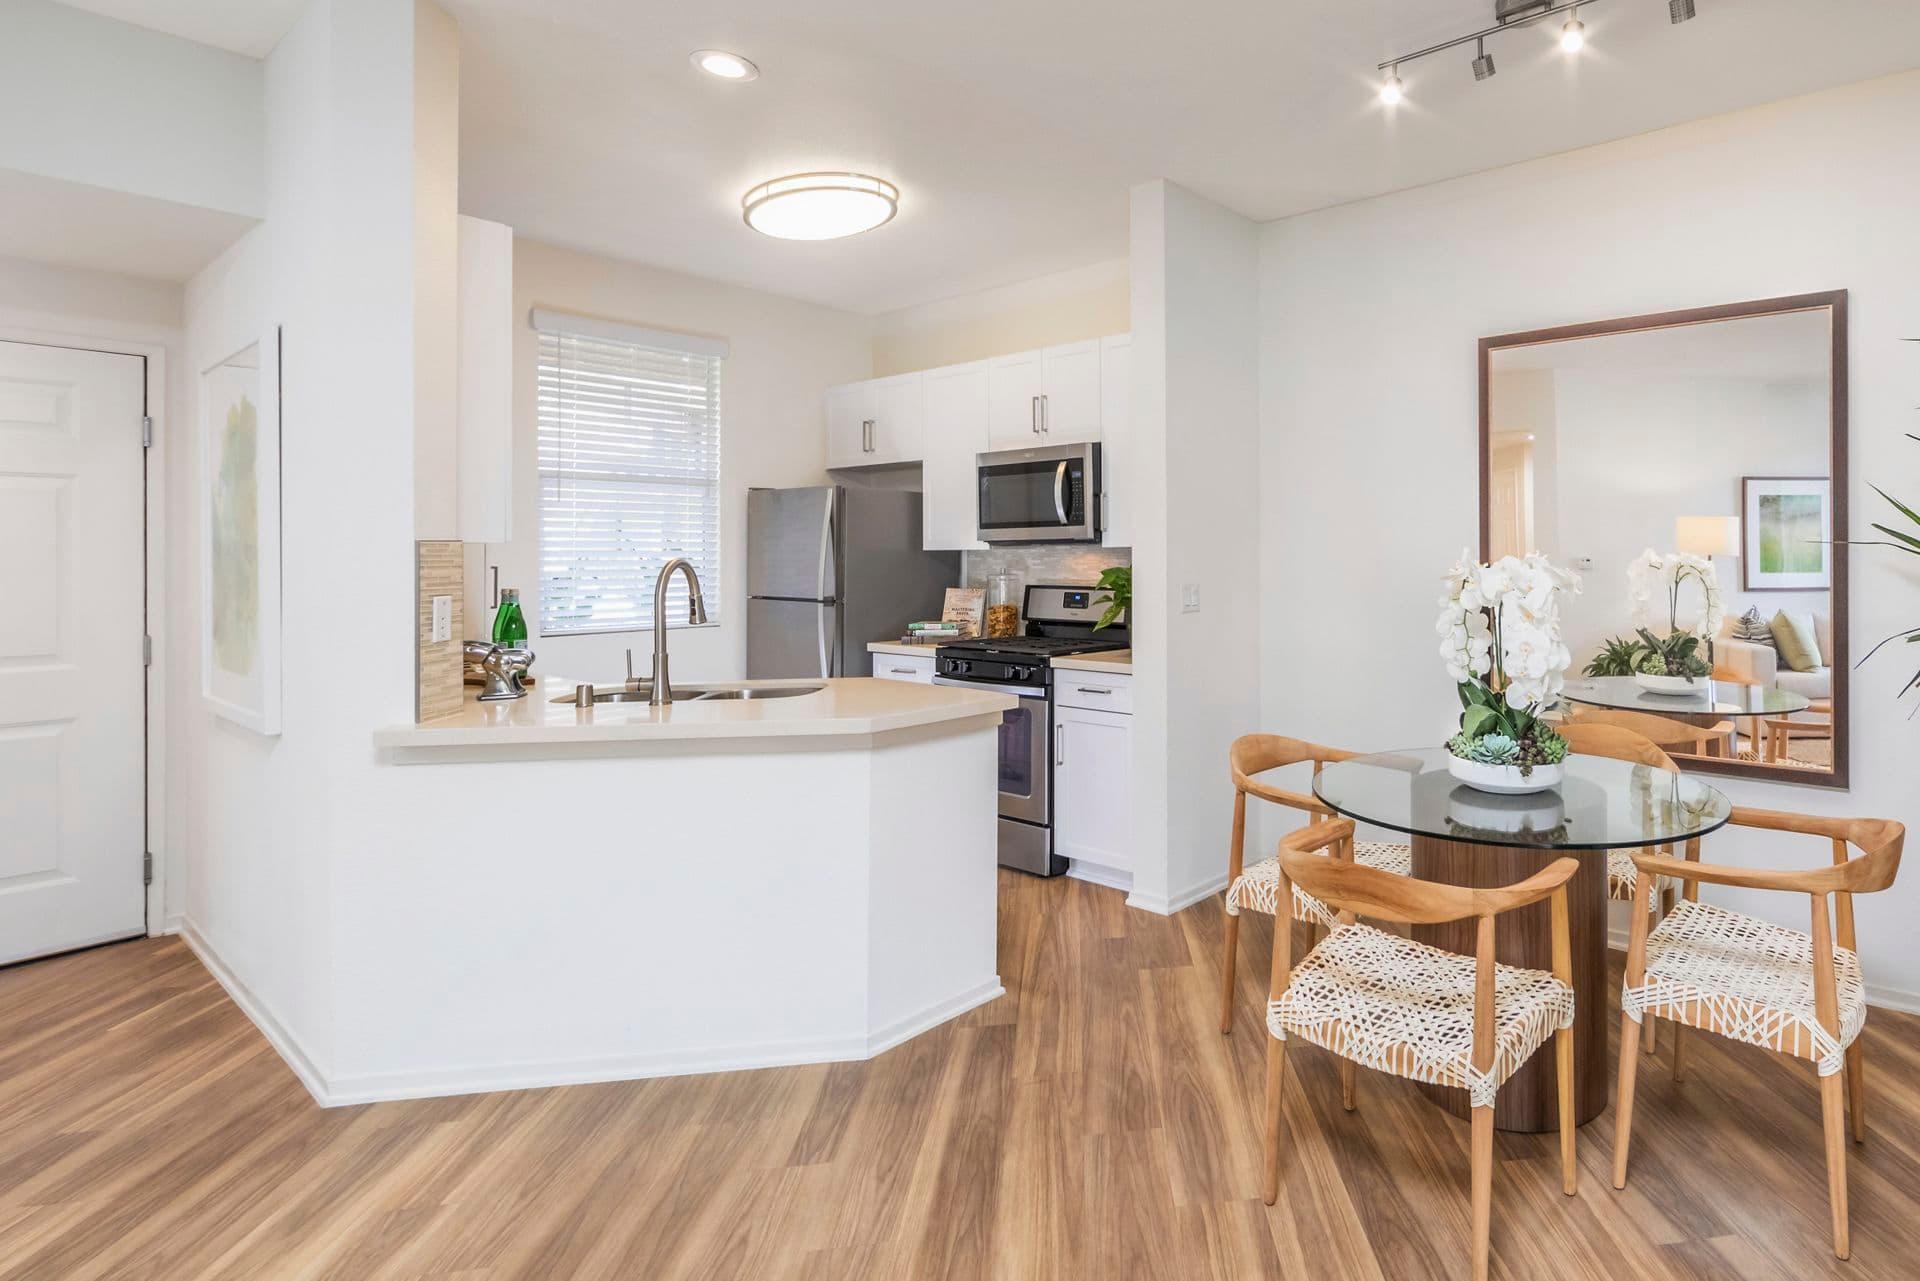 Interior view of dining room  at Vista Bella Apartment Homes in Aliso Viejo, CA.